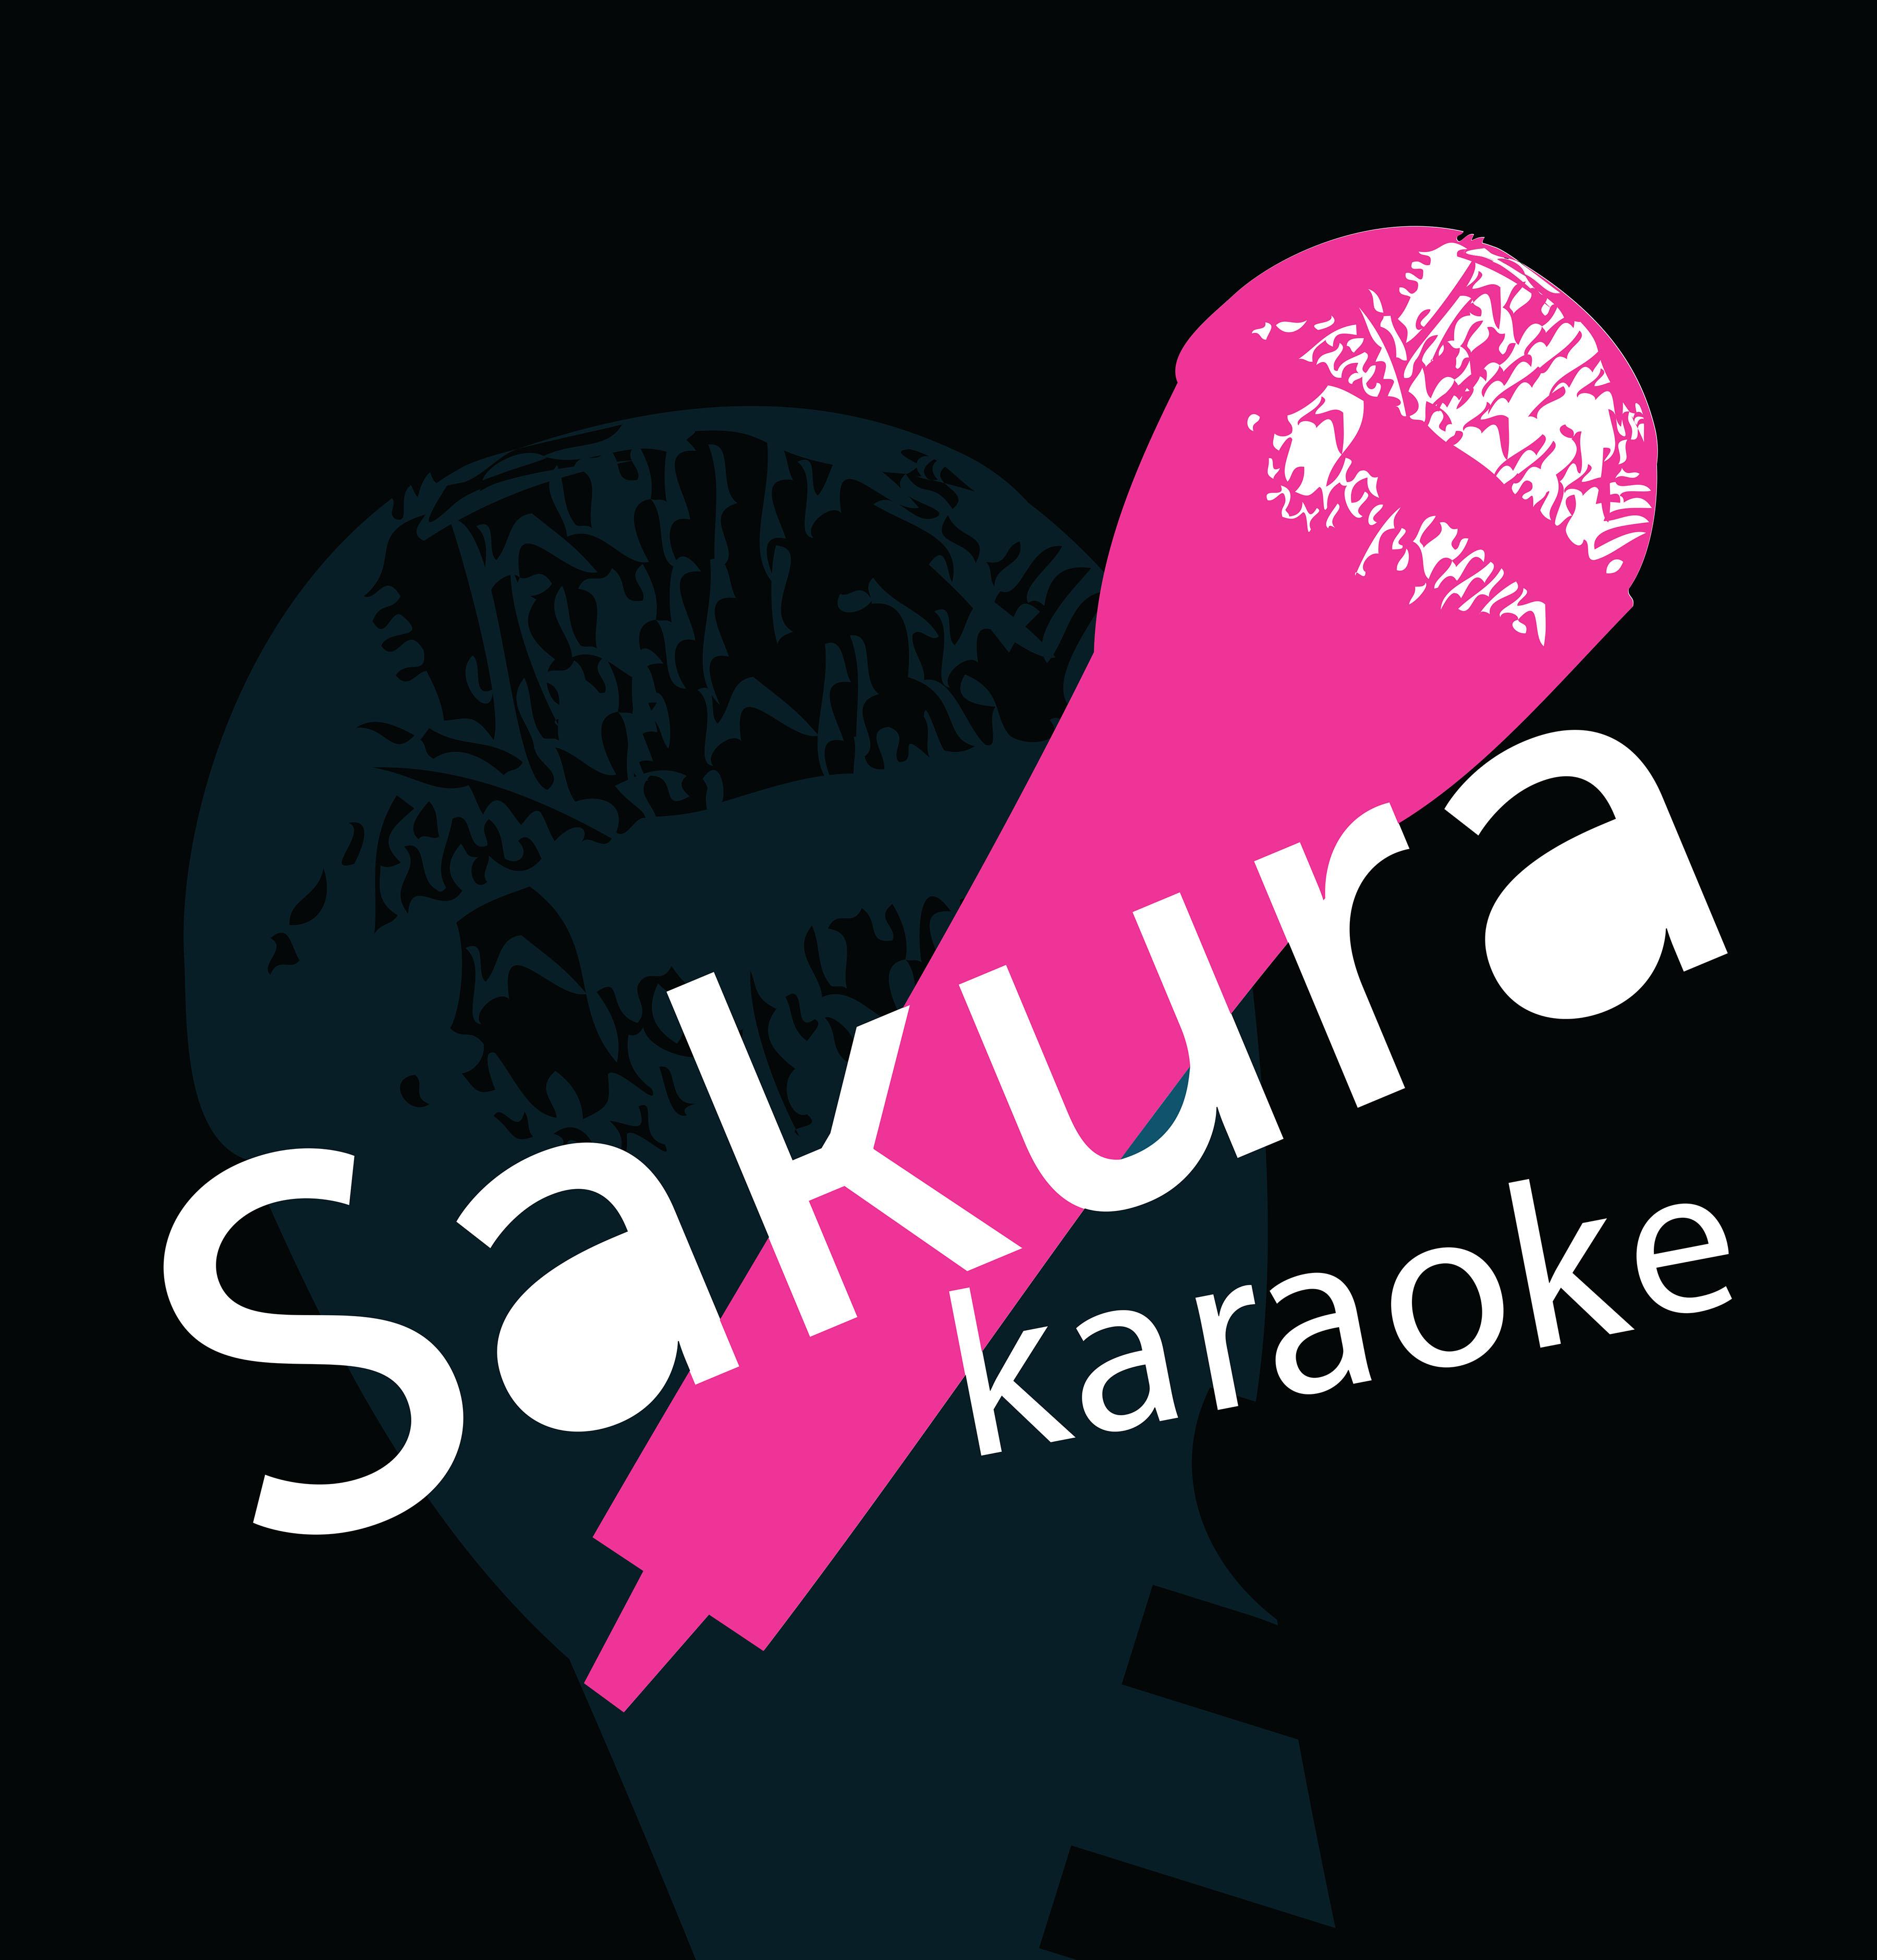 karaoke chicago cermak sakura karaoke bar. Black Bedroom Furniture Sets. Home Design Ideas